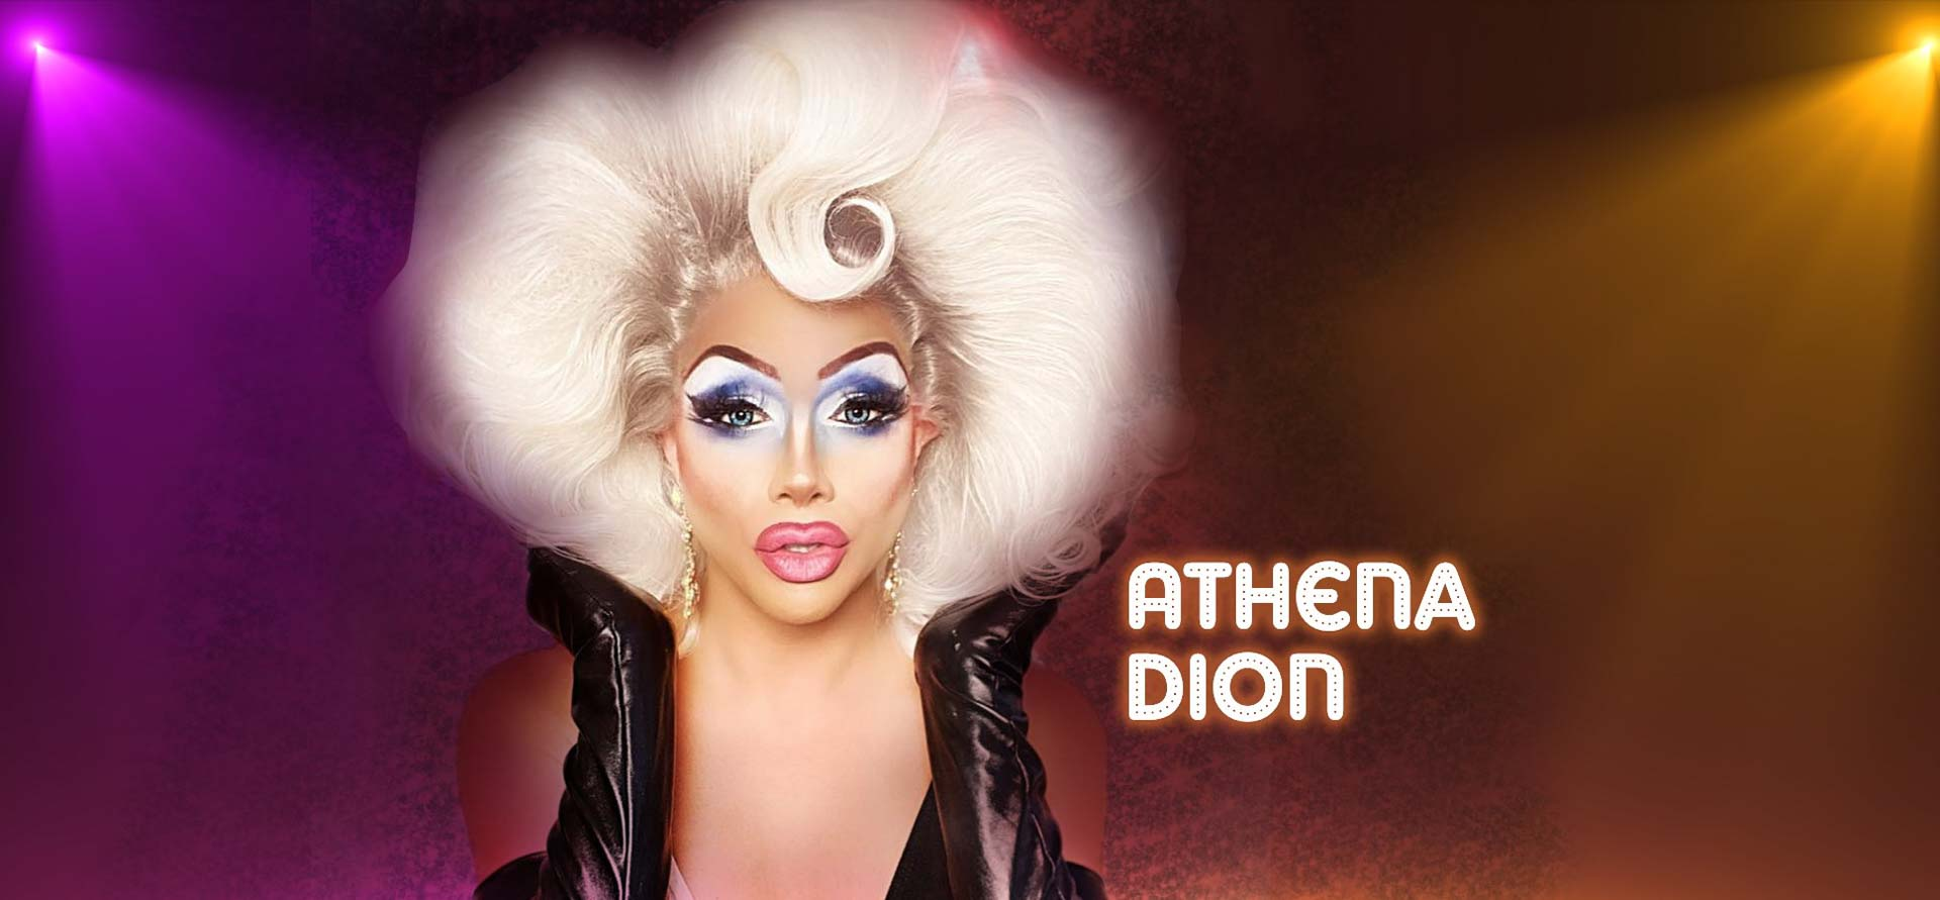 Athena Dion